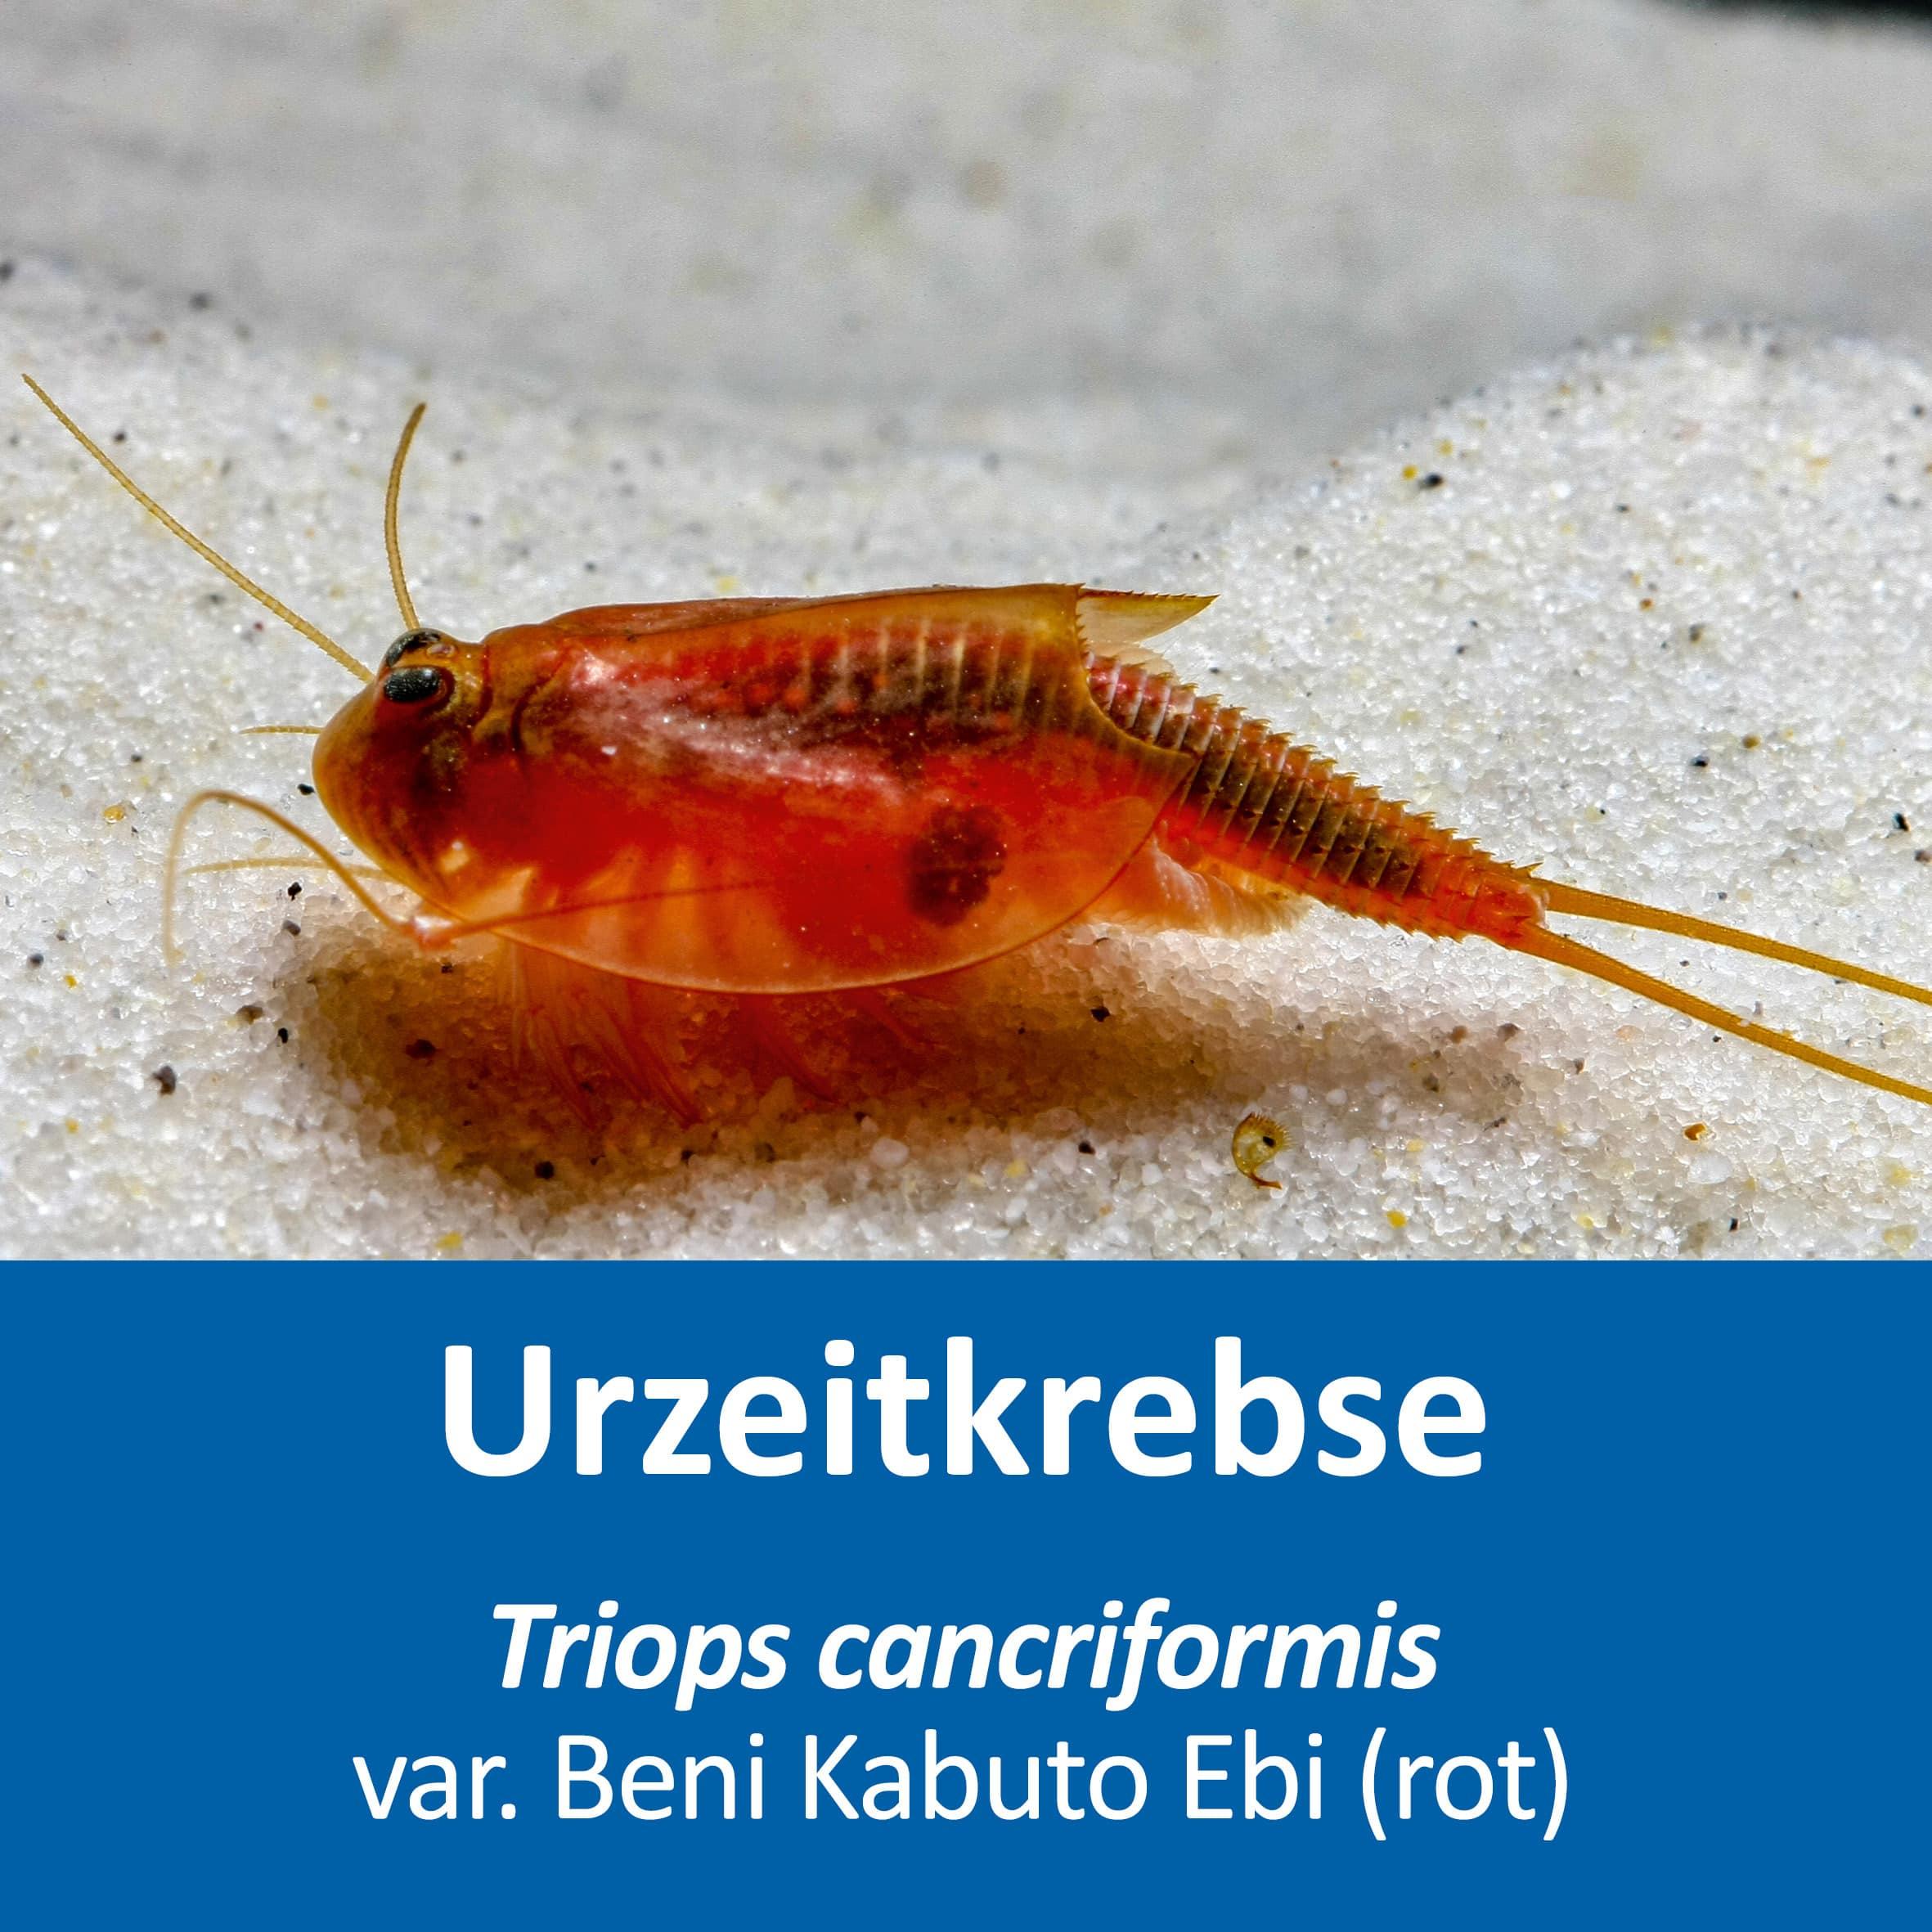 Triops cancriformis var. Beni Kabuto Ebi (rot)